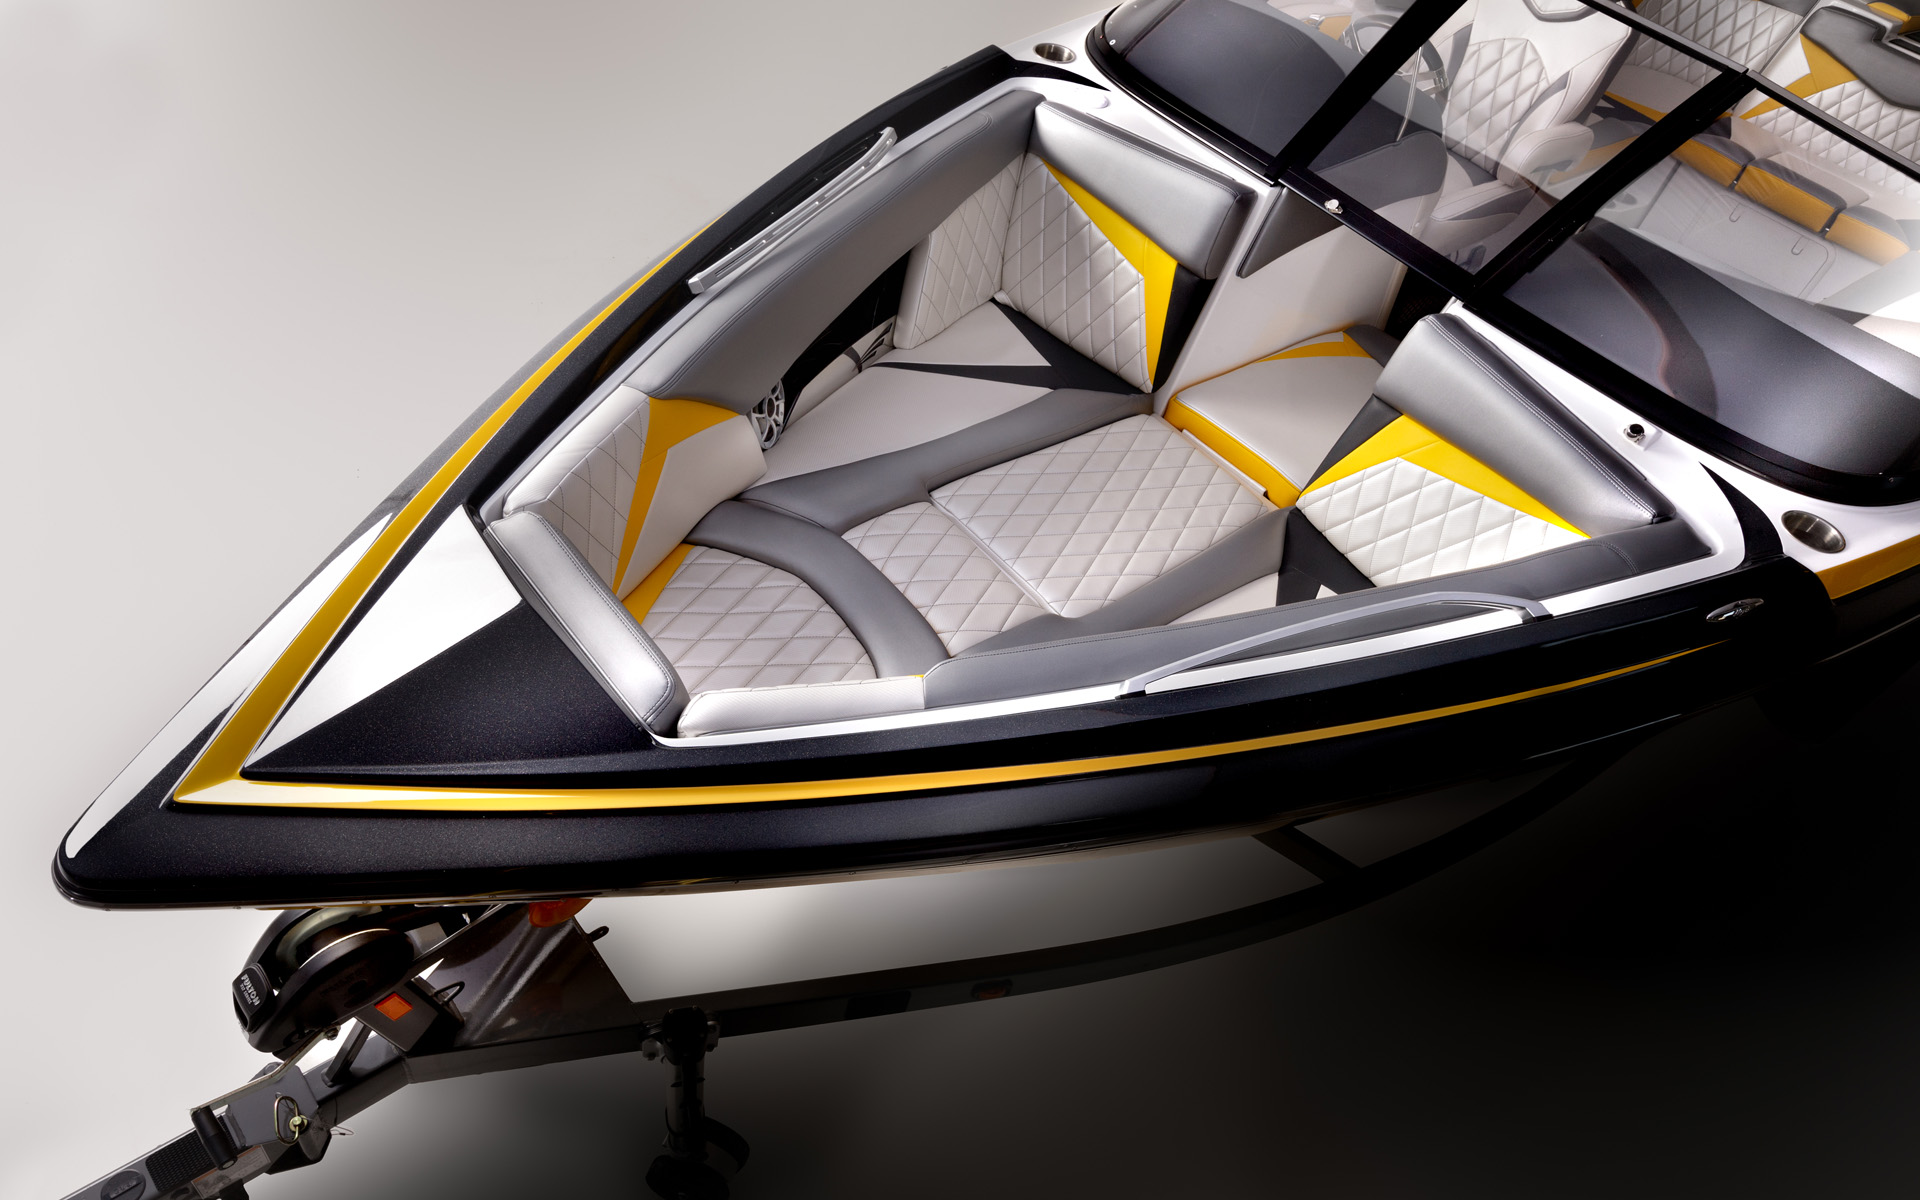 Tigé Boats Catalog Photography